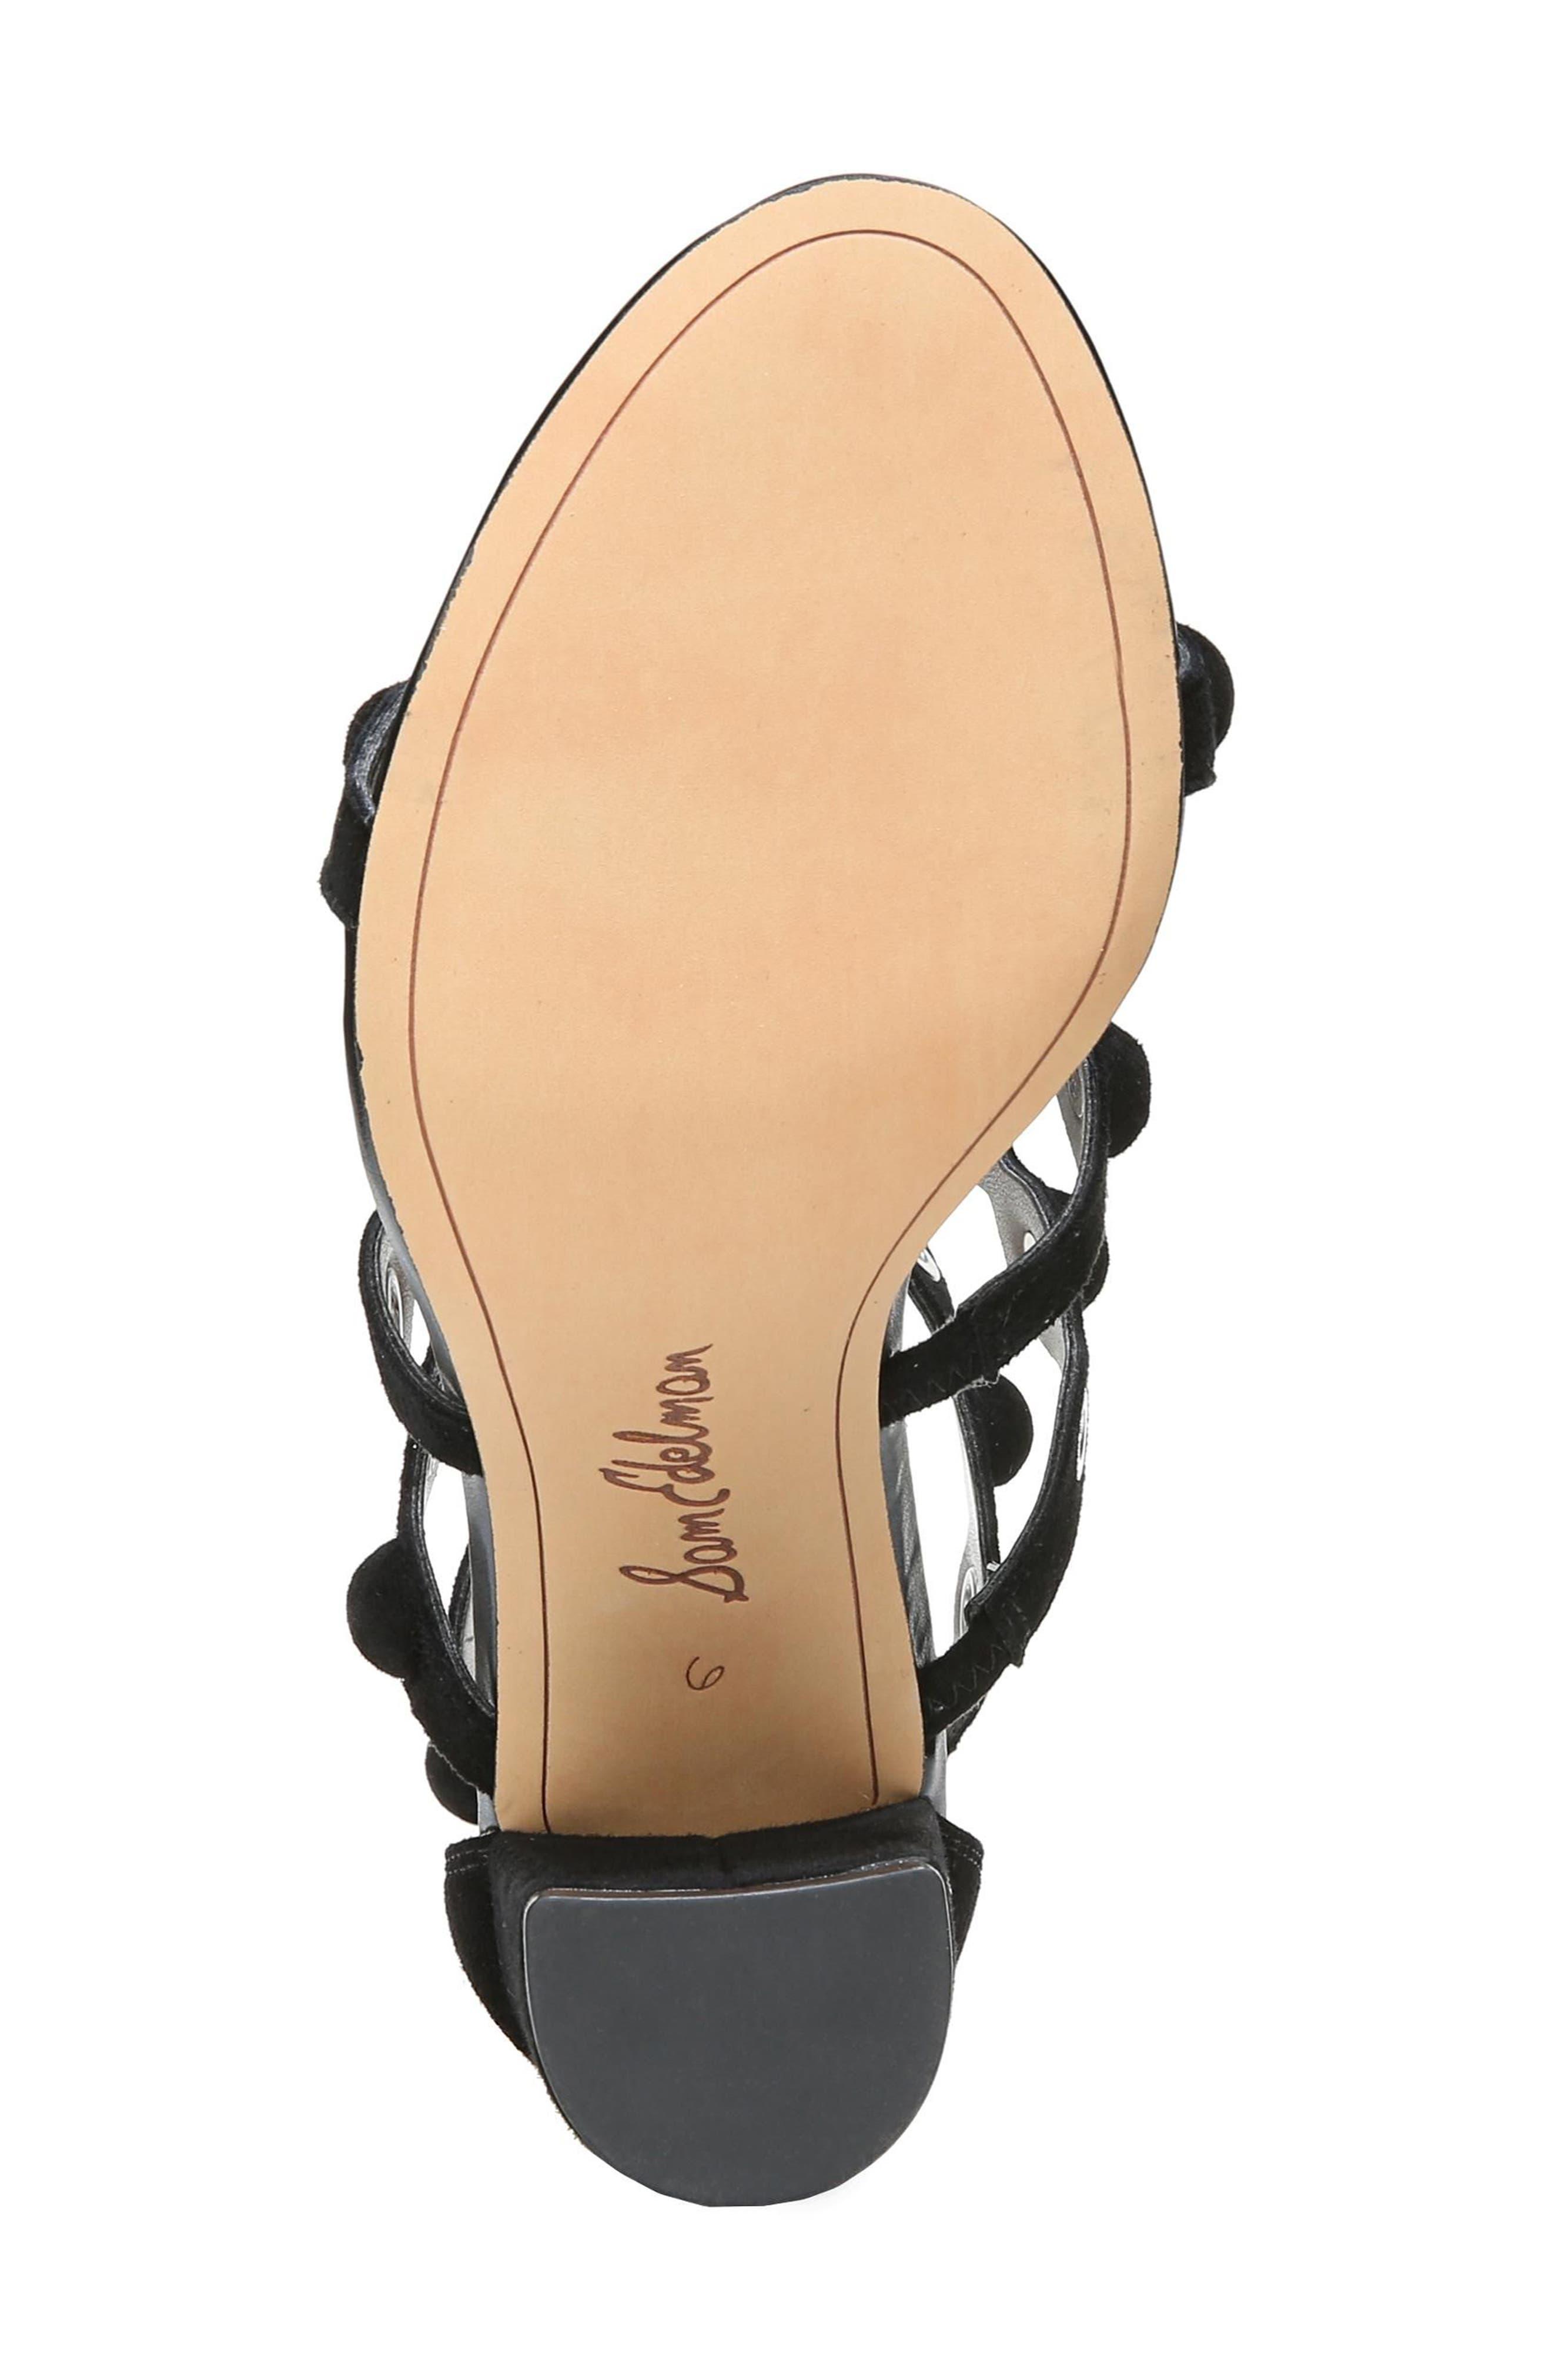 Yuli Grommet Sandal,                             Alternate thumbnail 6, color,                             BLACK LEATHER